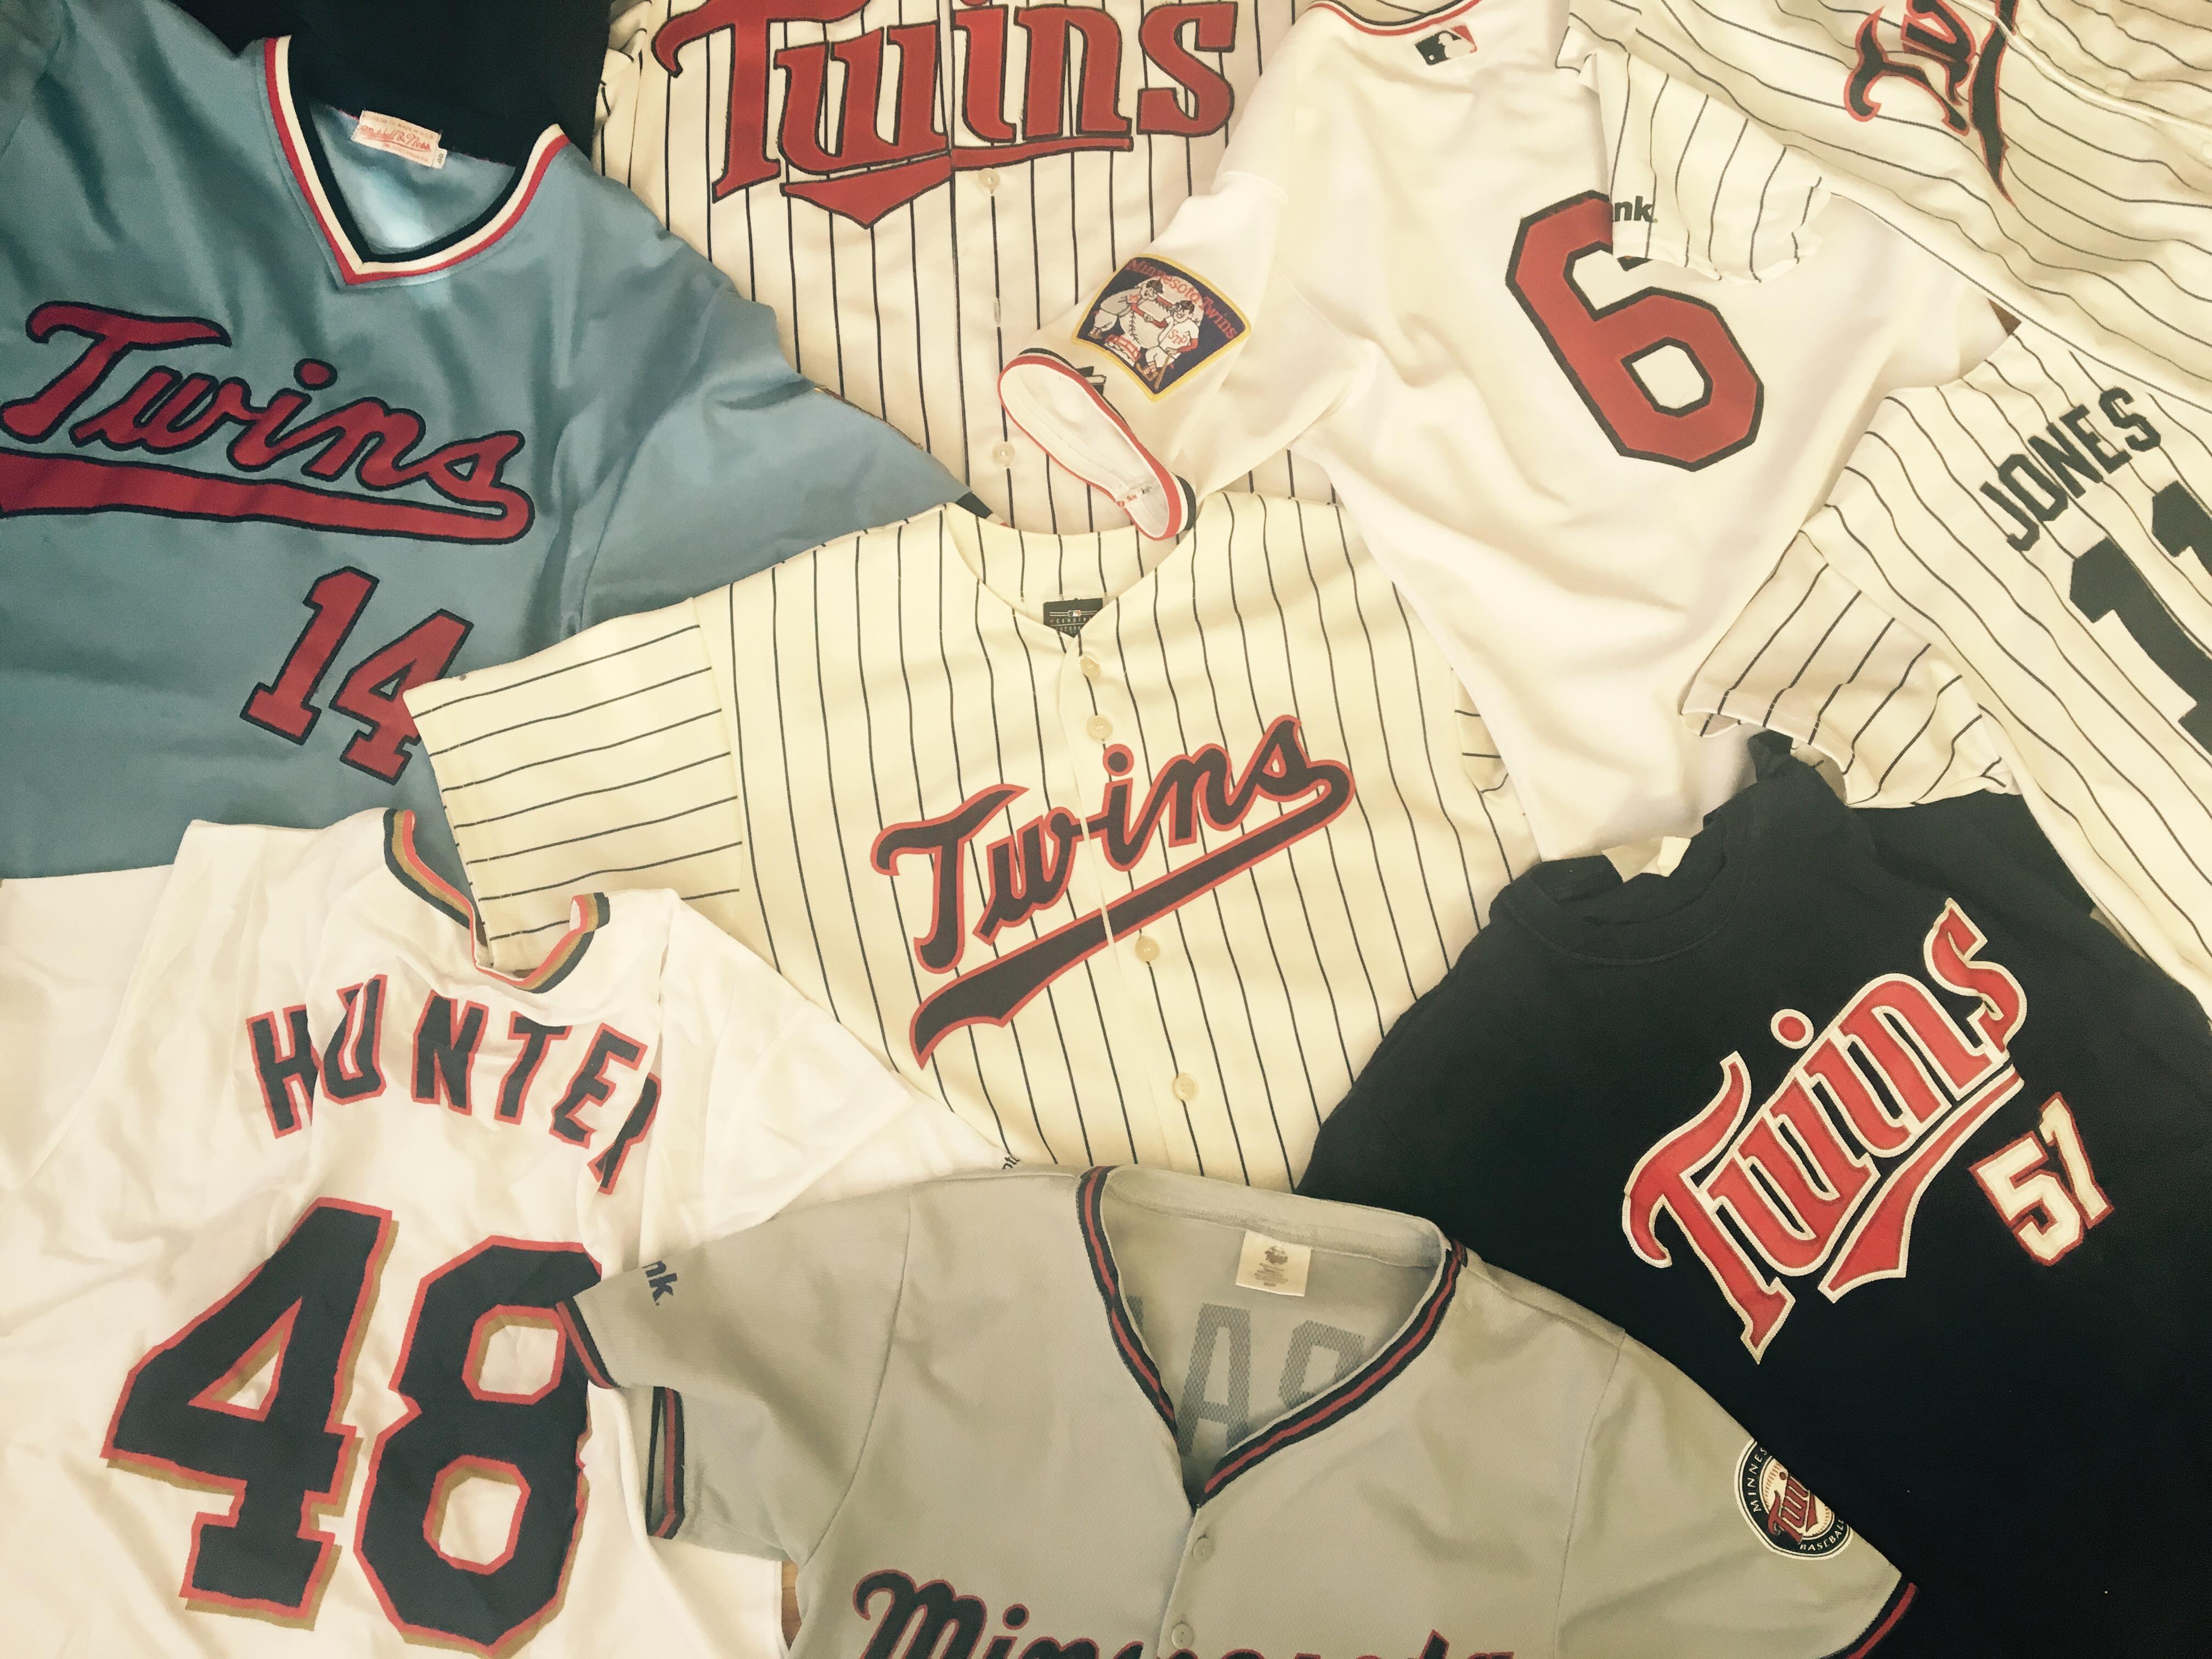 A small sample of jerseys and shirseys.